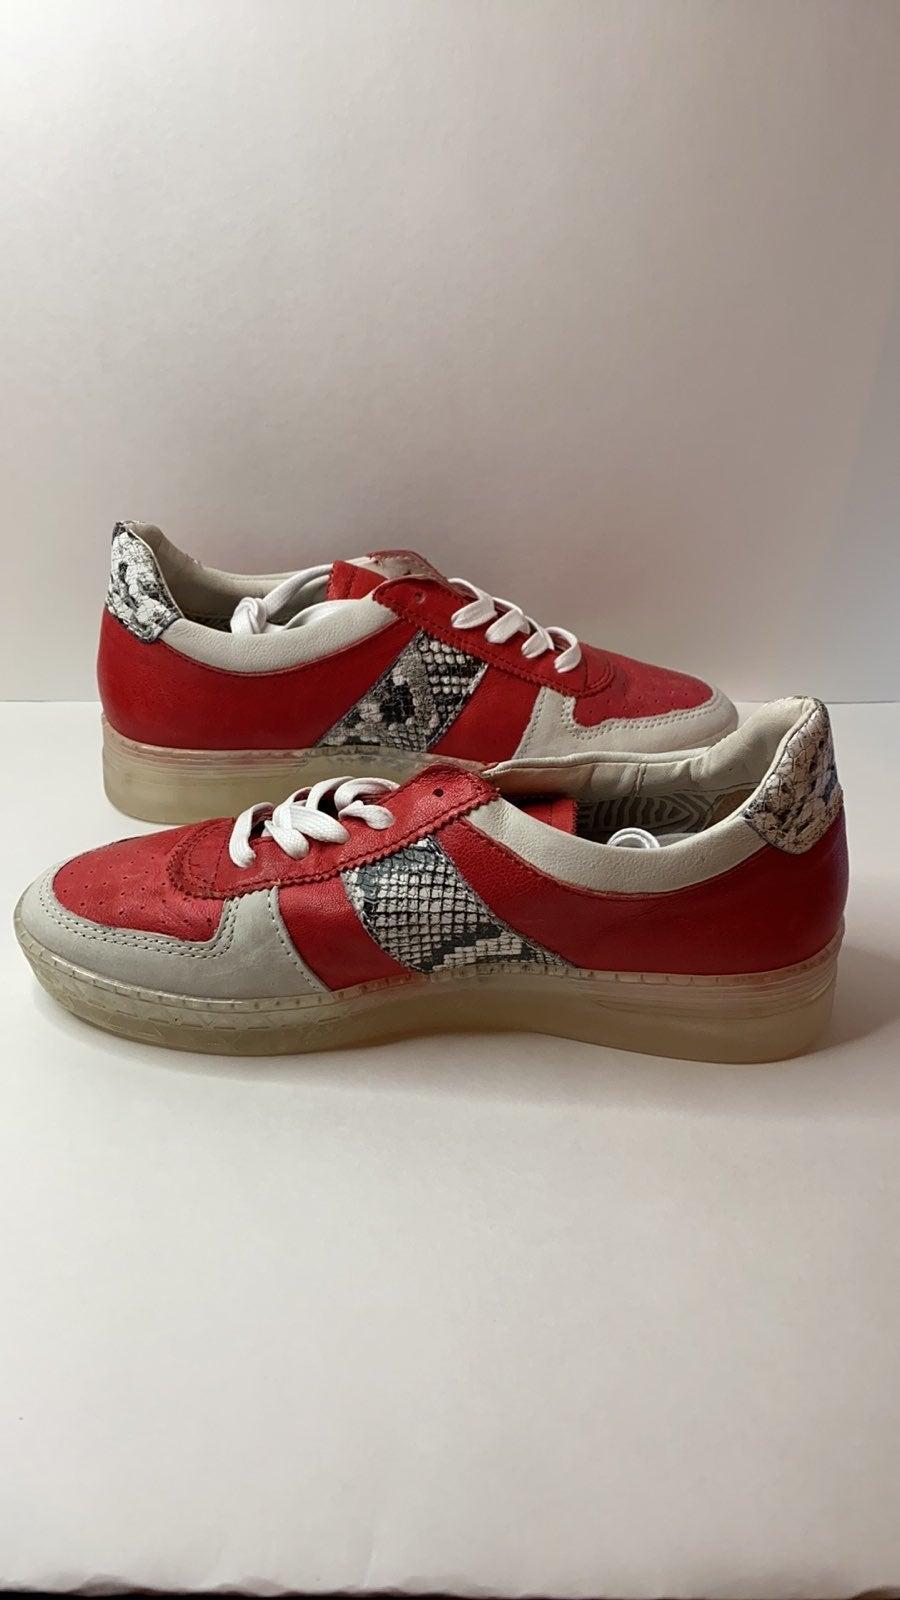 Size 39 Miz Mooz Leather Sneakers - Flip NWOT